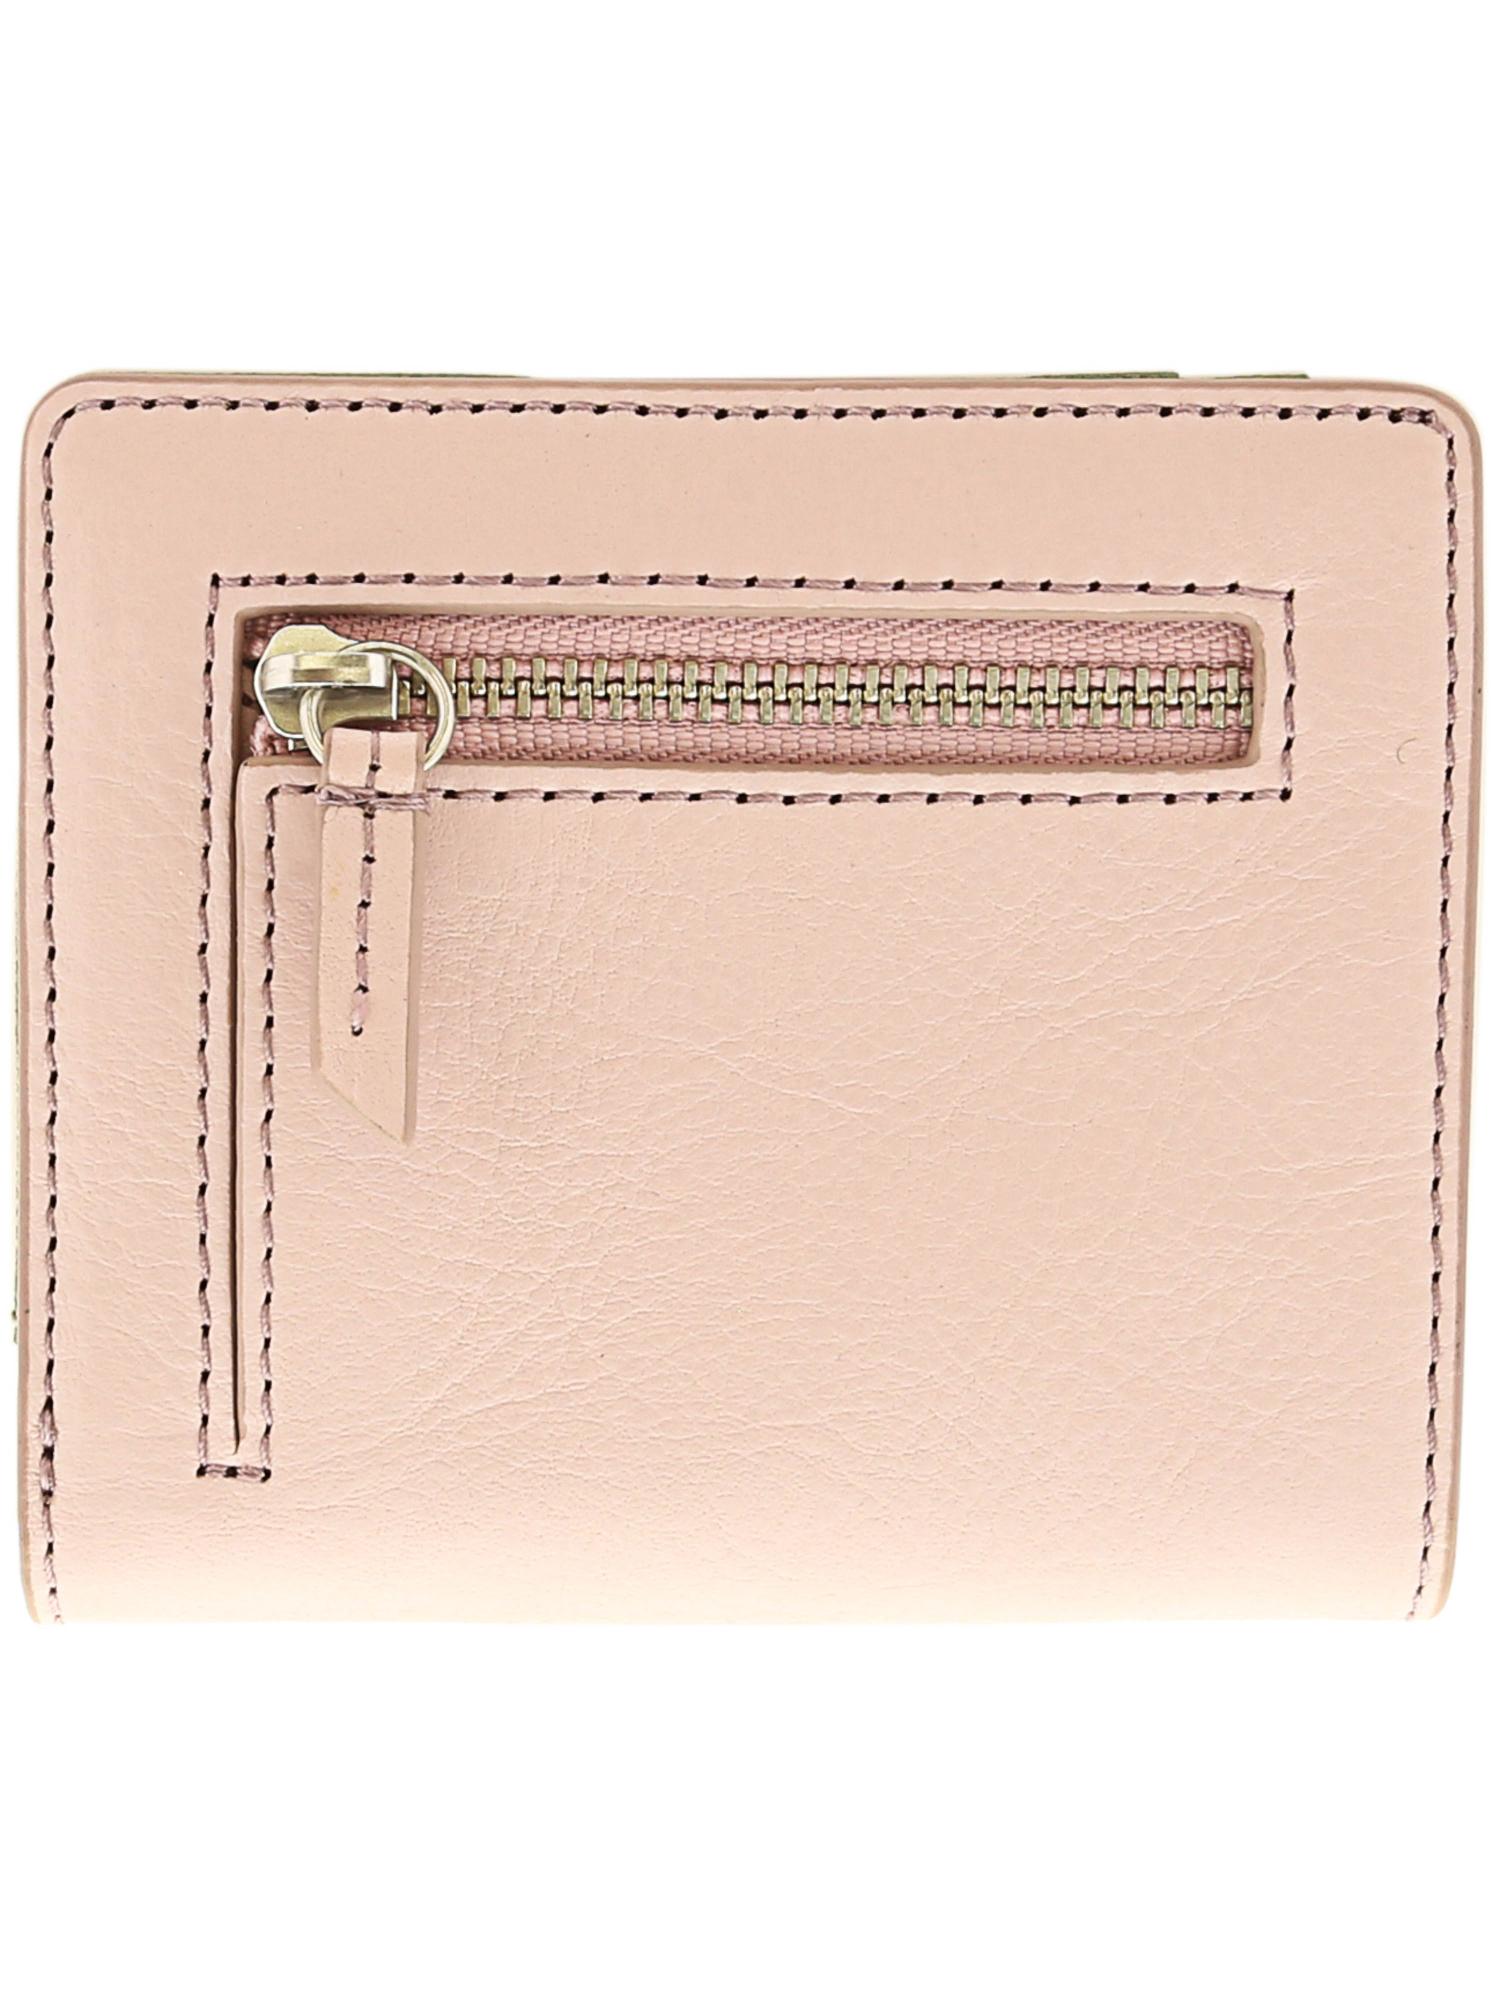 Fossil-Women-039-s-Emma-Rfid-Mini-Leather-Wallet thumbnail 11